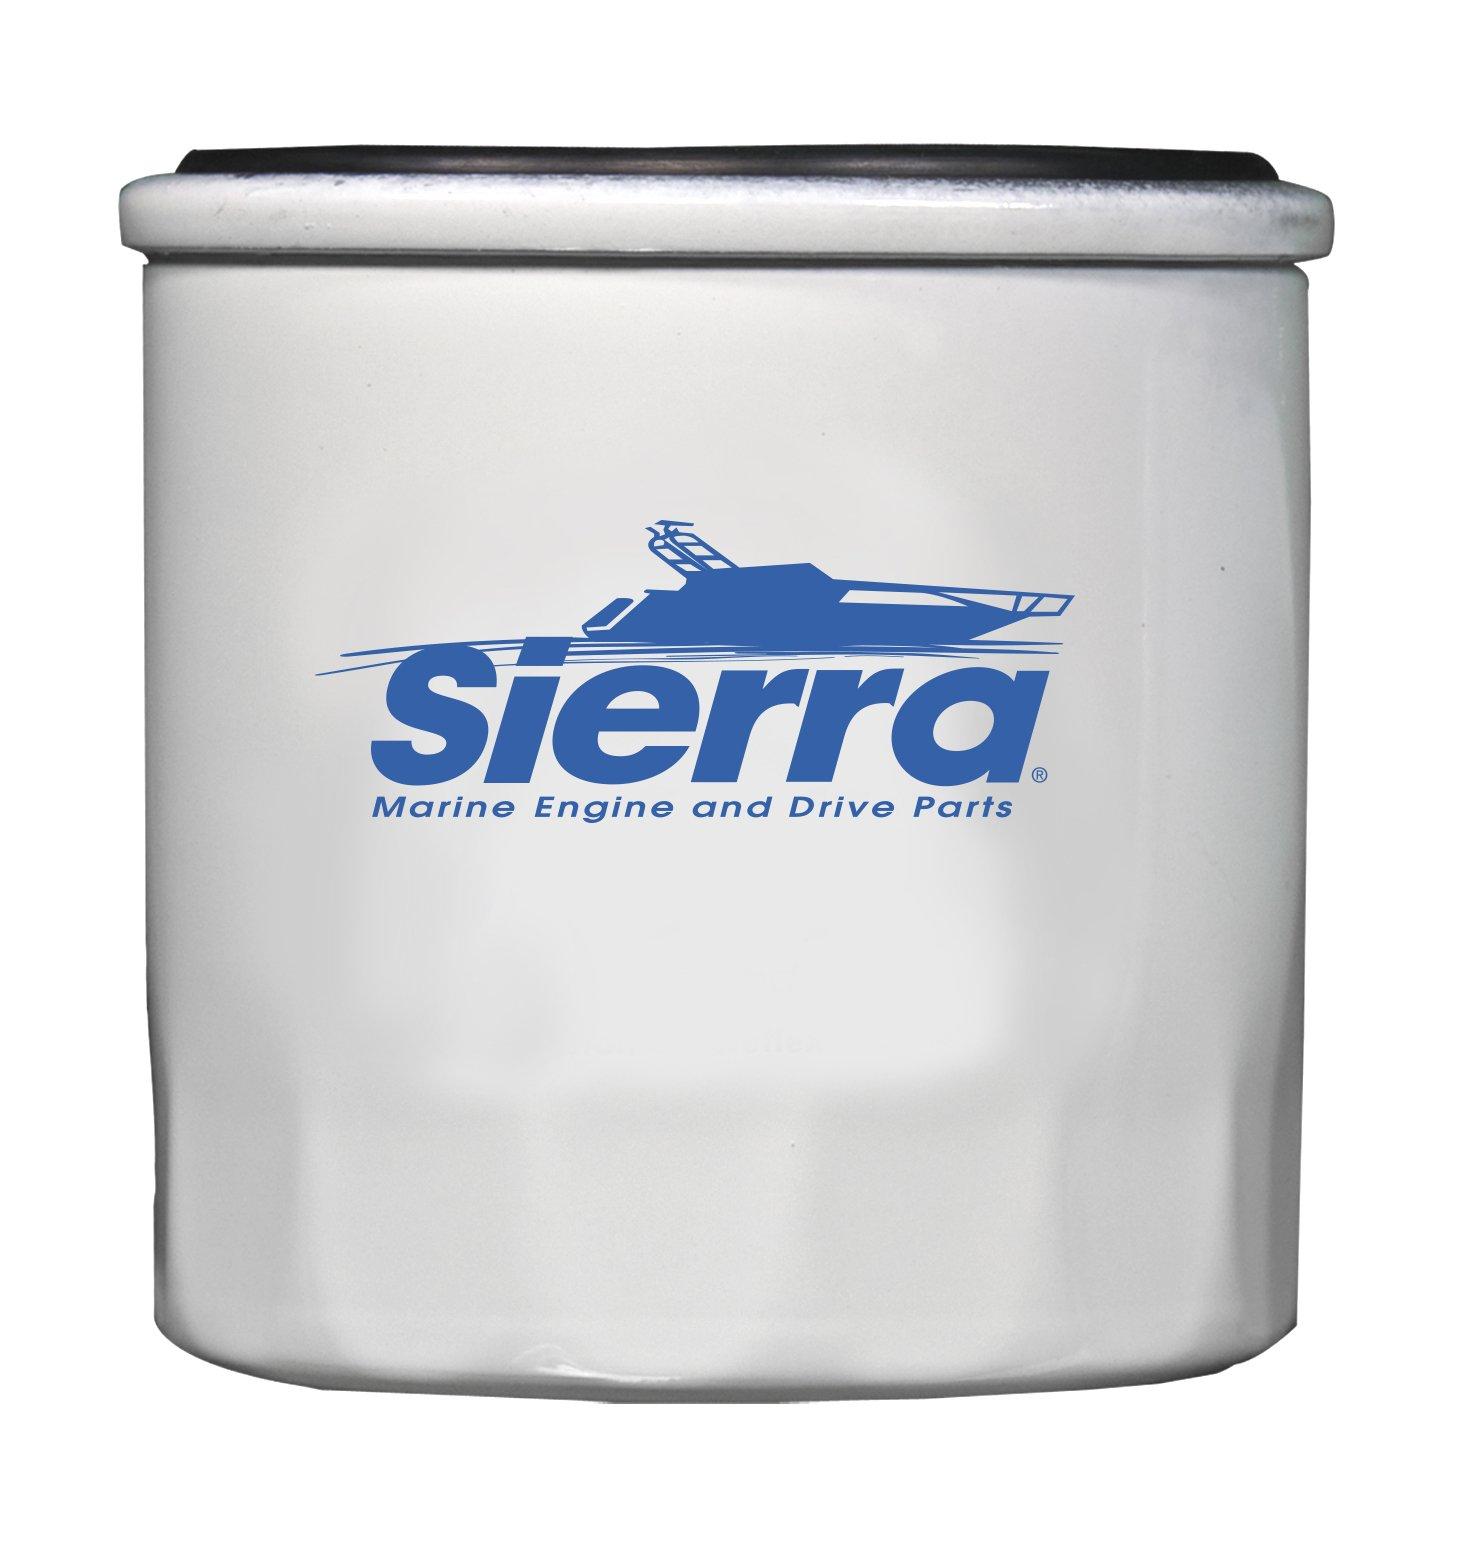 Sierra International 18-7911-1 Oil Filter for Yamaha, Honda and Nissan/Tohatsu Marine Outboard Engines